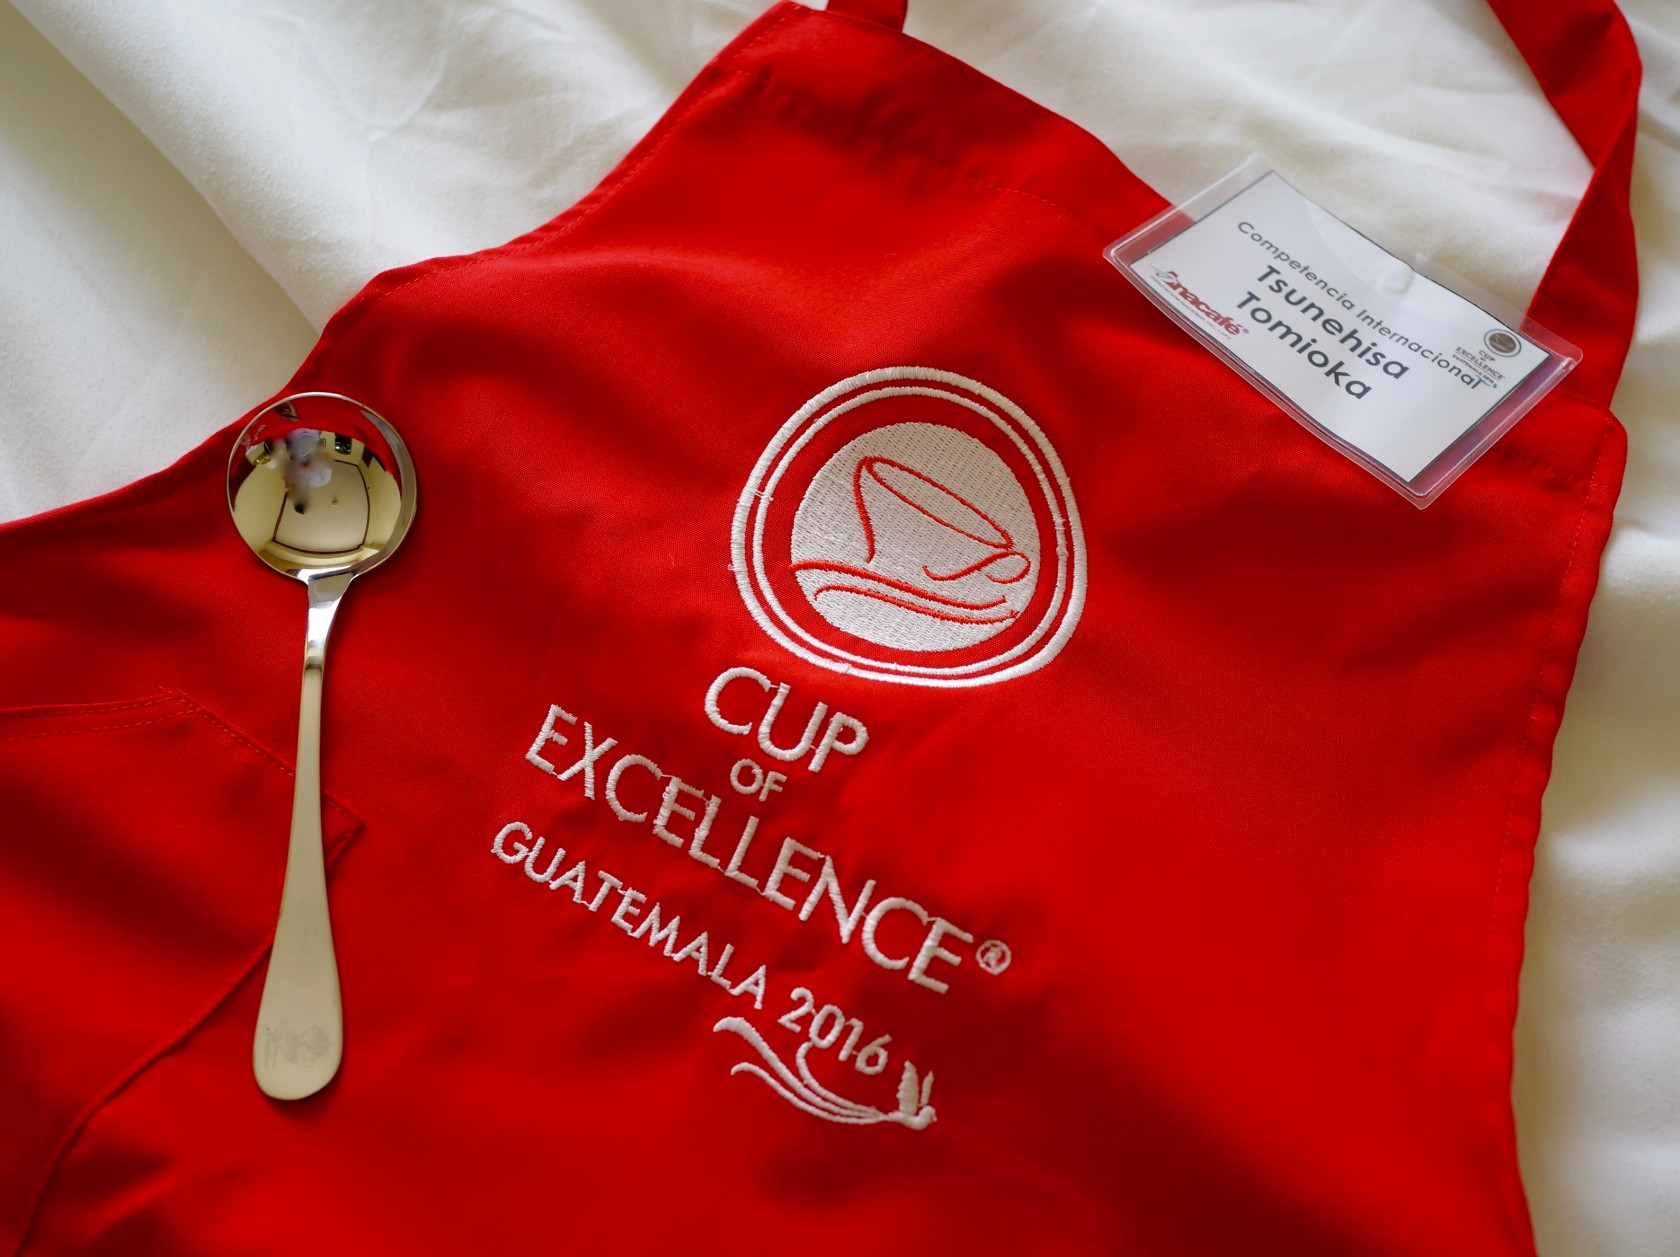 Top of topのスペシャルティコーヒーを決する国際審査会、Cup of Excellence®2016 Guatemalaに参加して ①